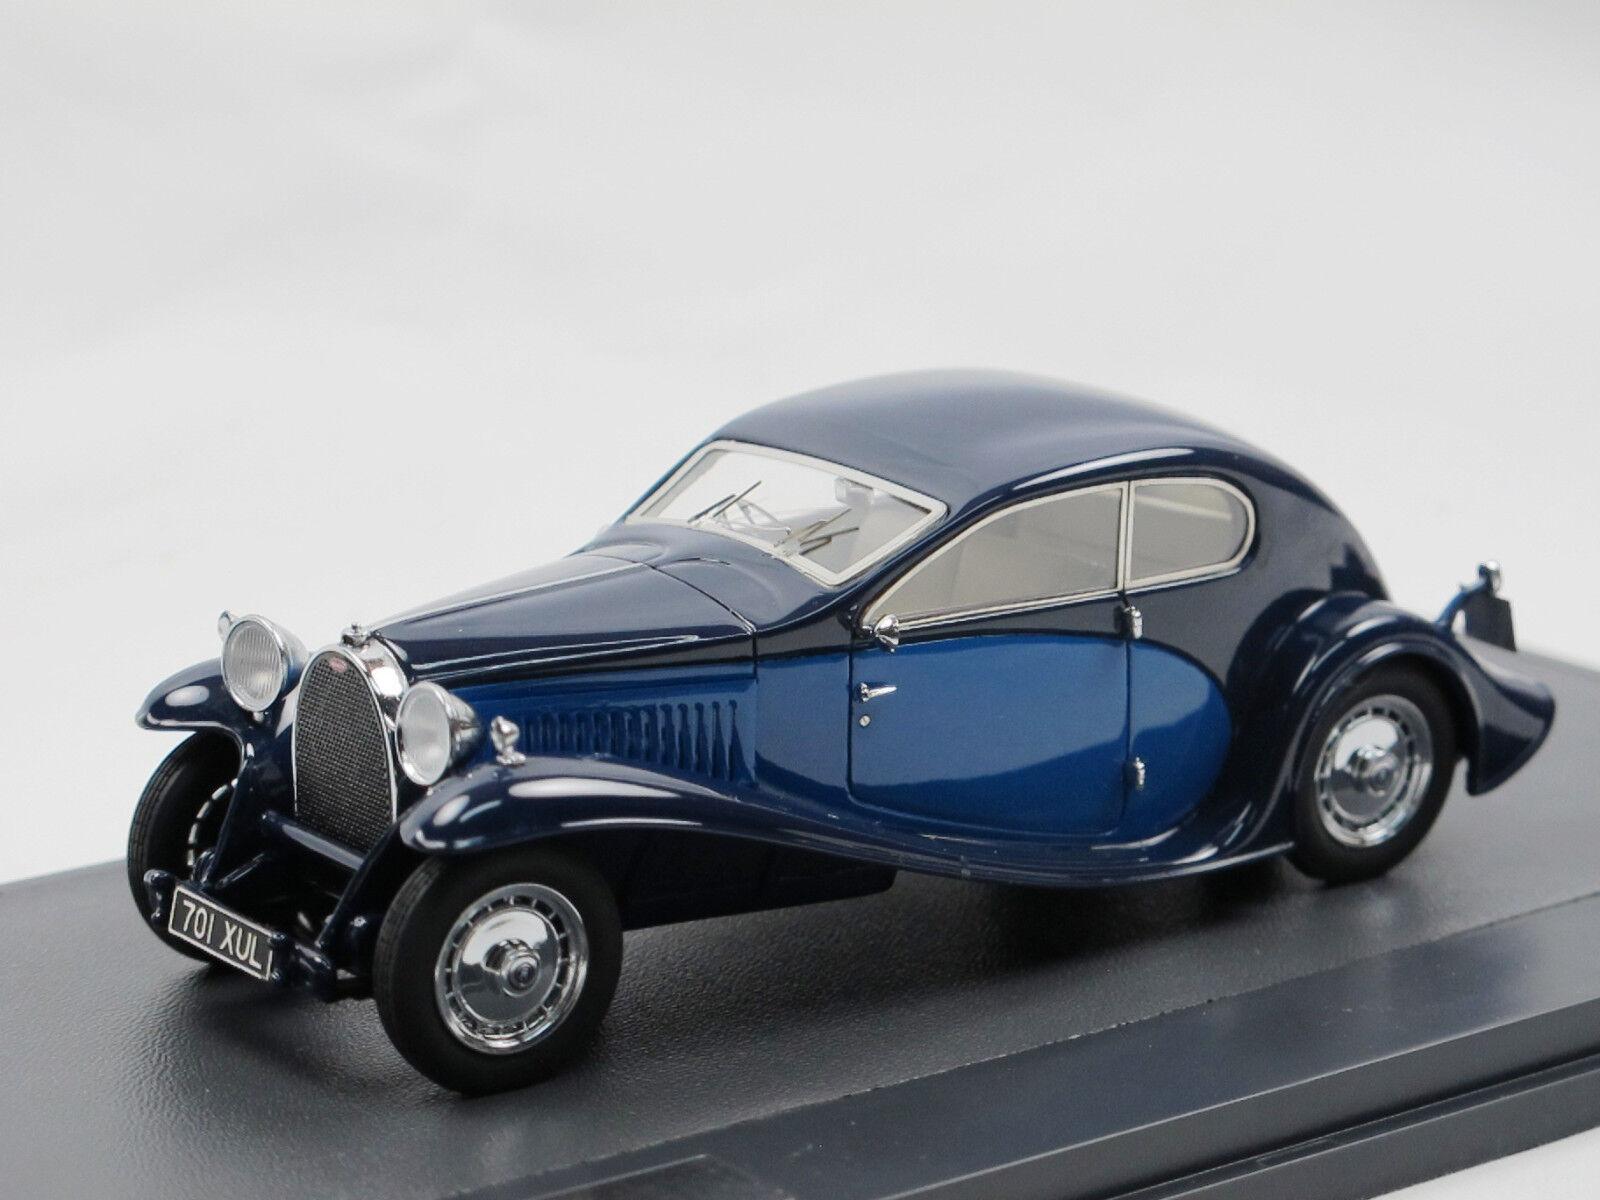 MATRIX SCALE MODELS 1930 Bugatti Type 46 Super profils profils profils bleu 1 43 mx40205-012 add3e8